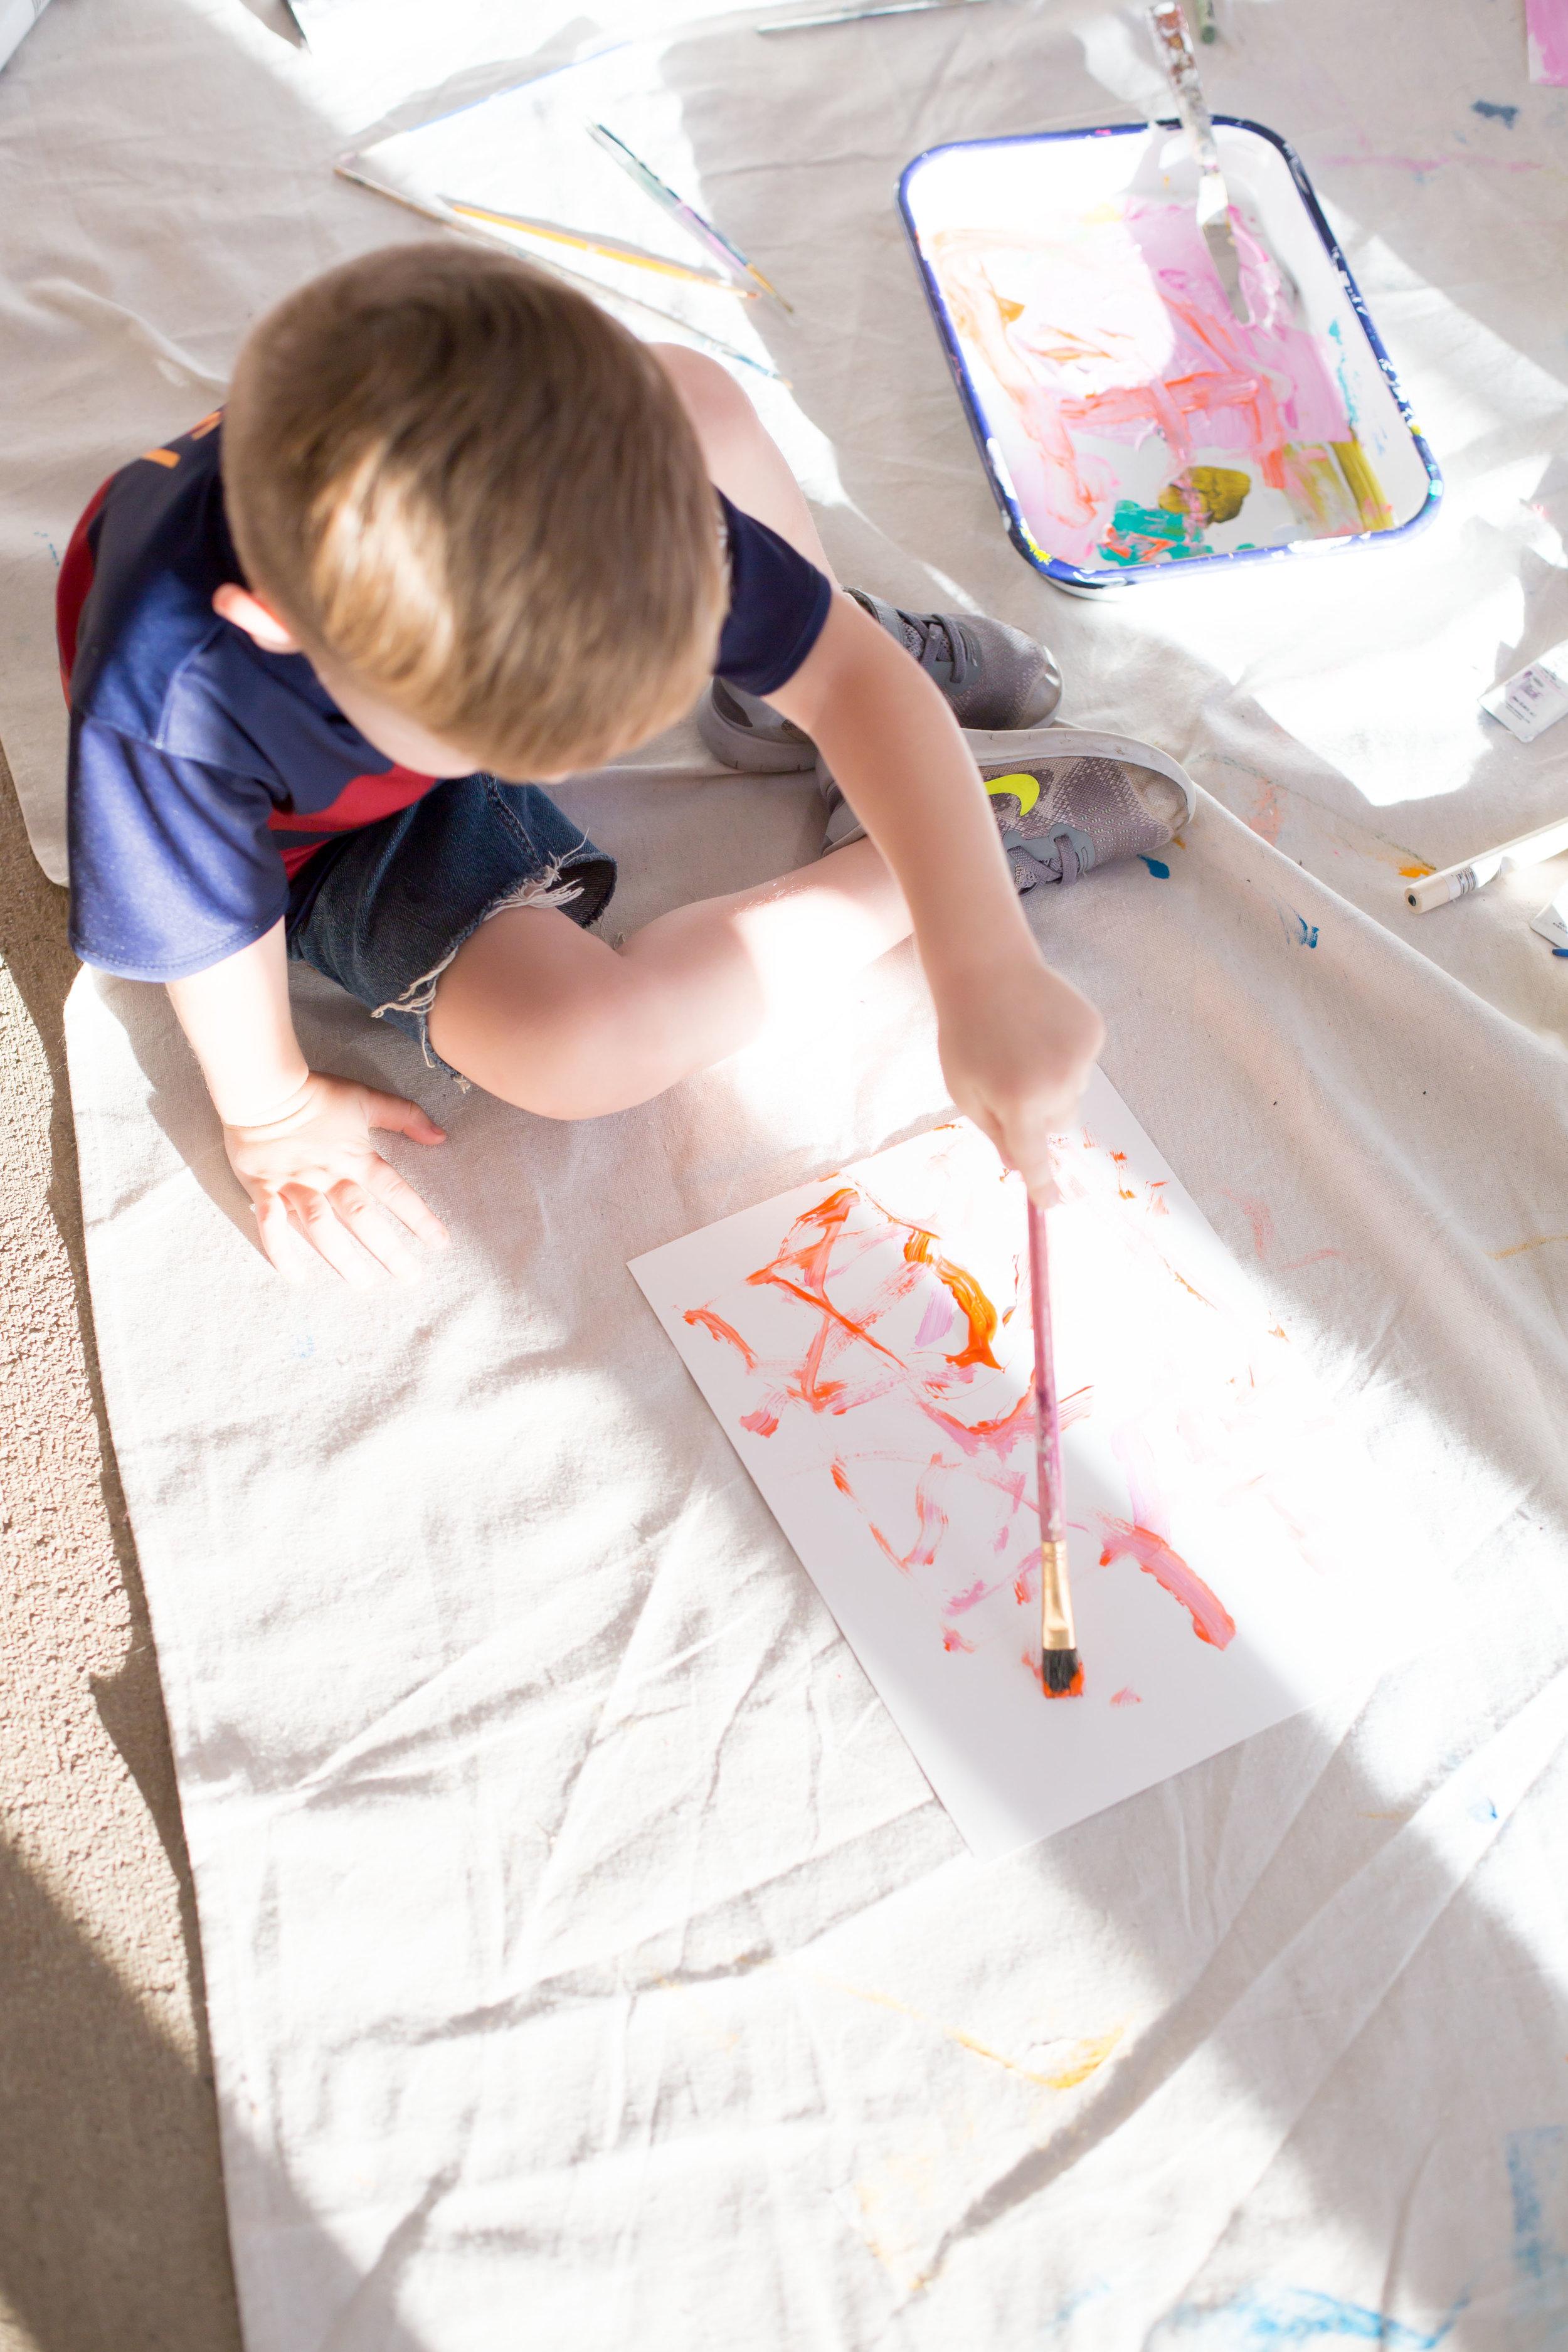 san-diego-branding-photographer-kids-painting-samantha-louise-marett-artist-4